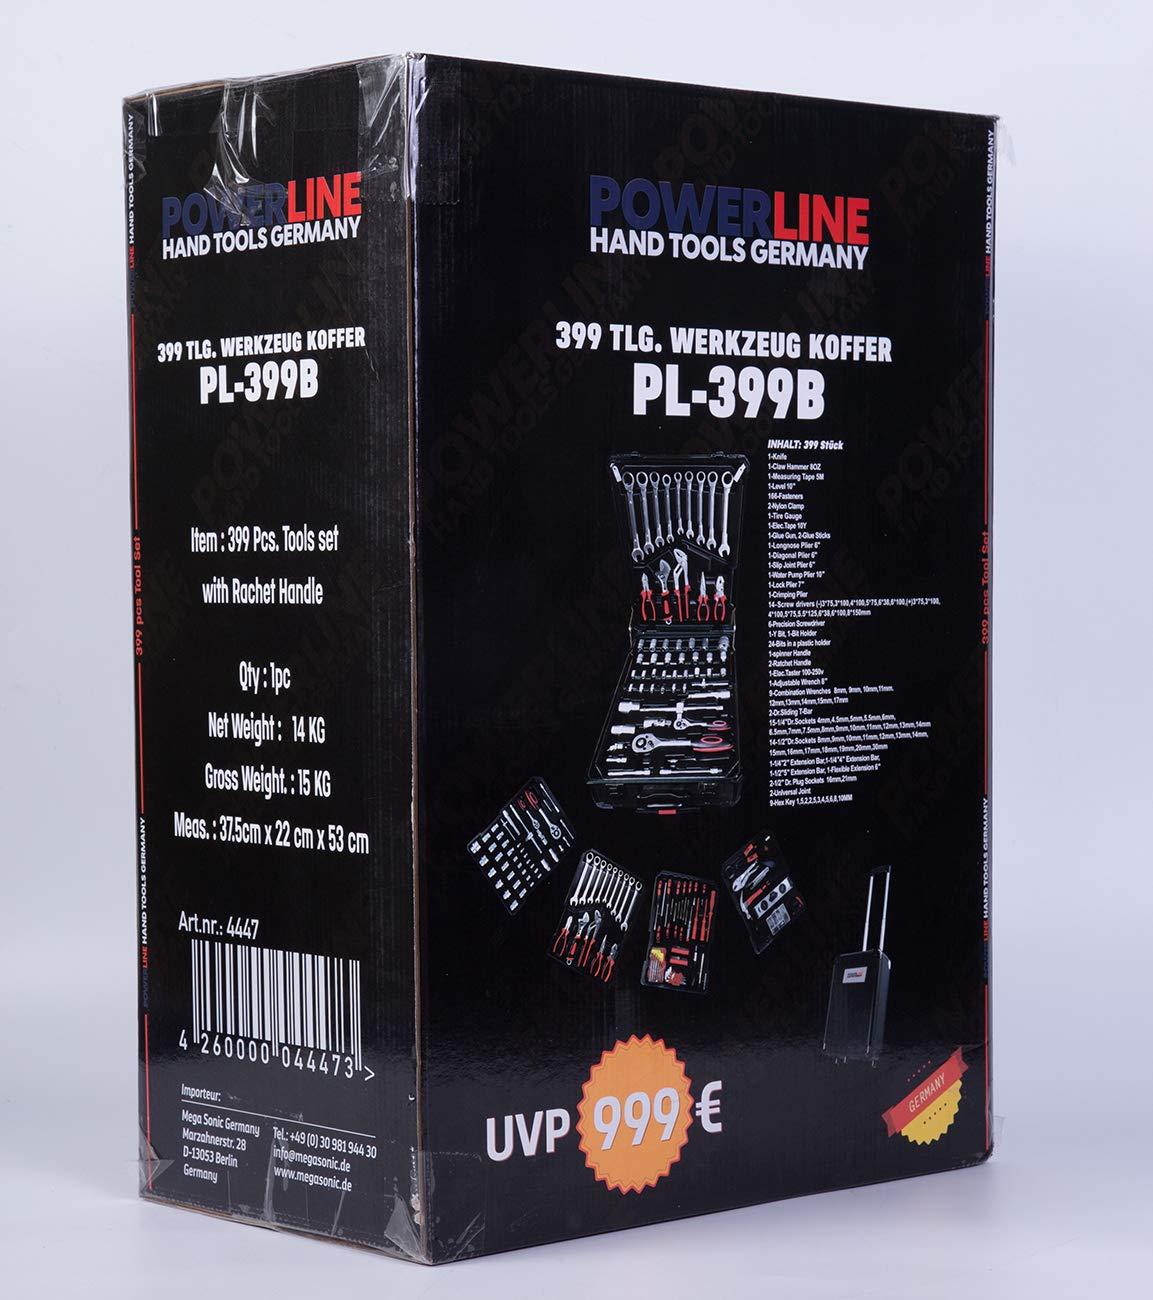 30 x tapones de Tapa tornillo plástico azul con Bisagras pliegue sobre Fit Size 6-8 calibre Tornillos